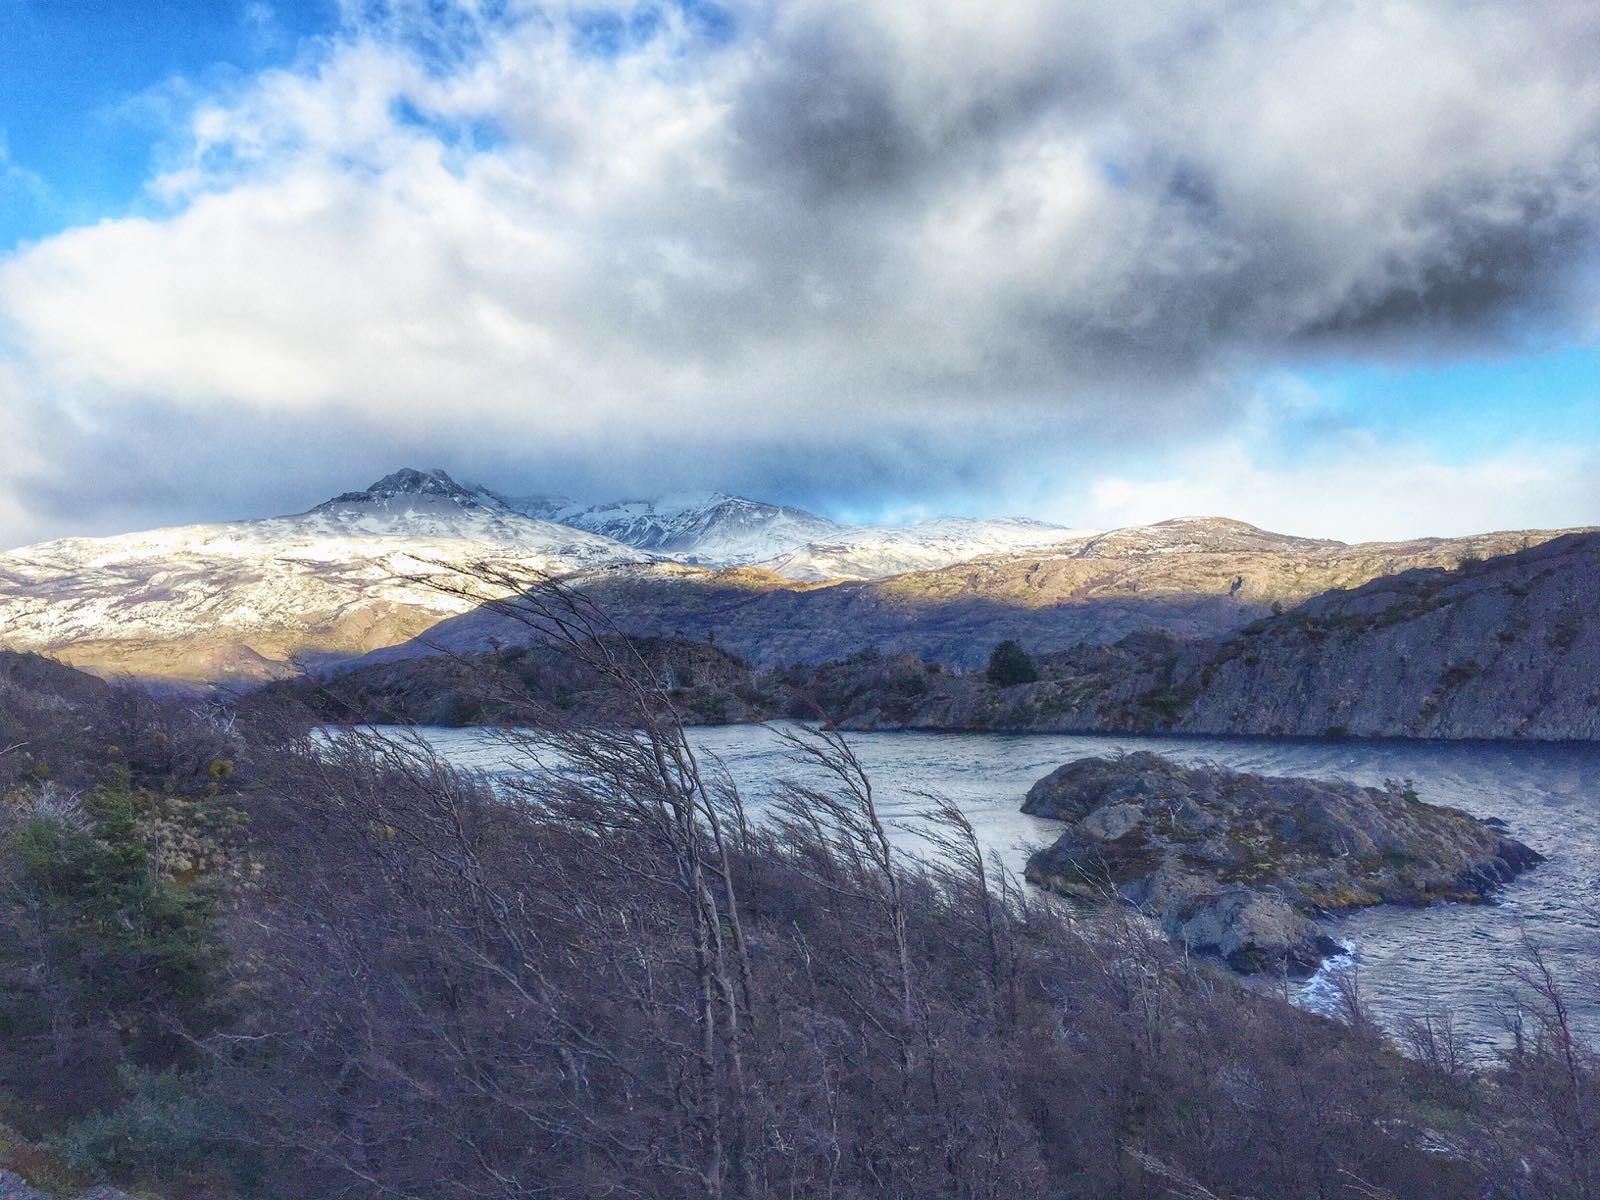 torres-del-paine-in-winter-lago-los-patos